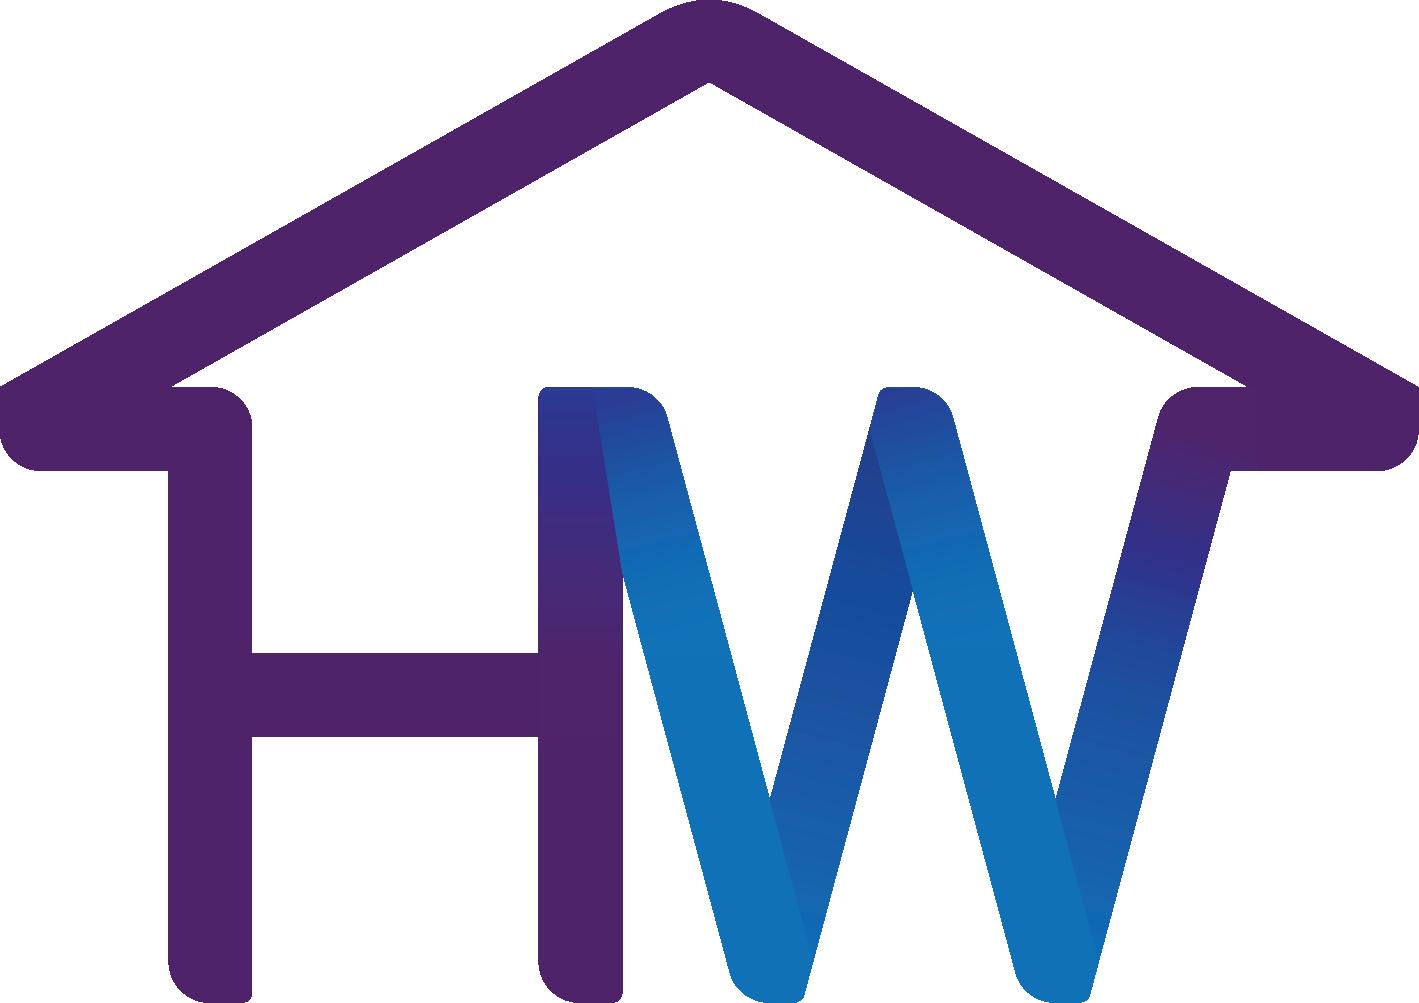 HostWell